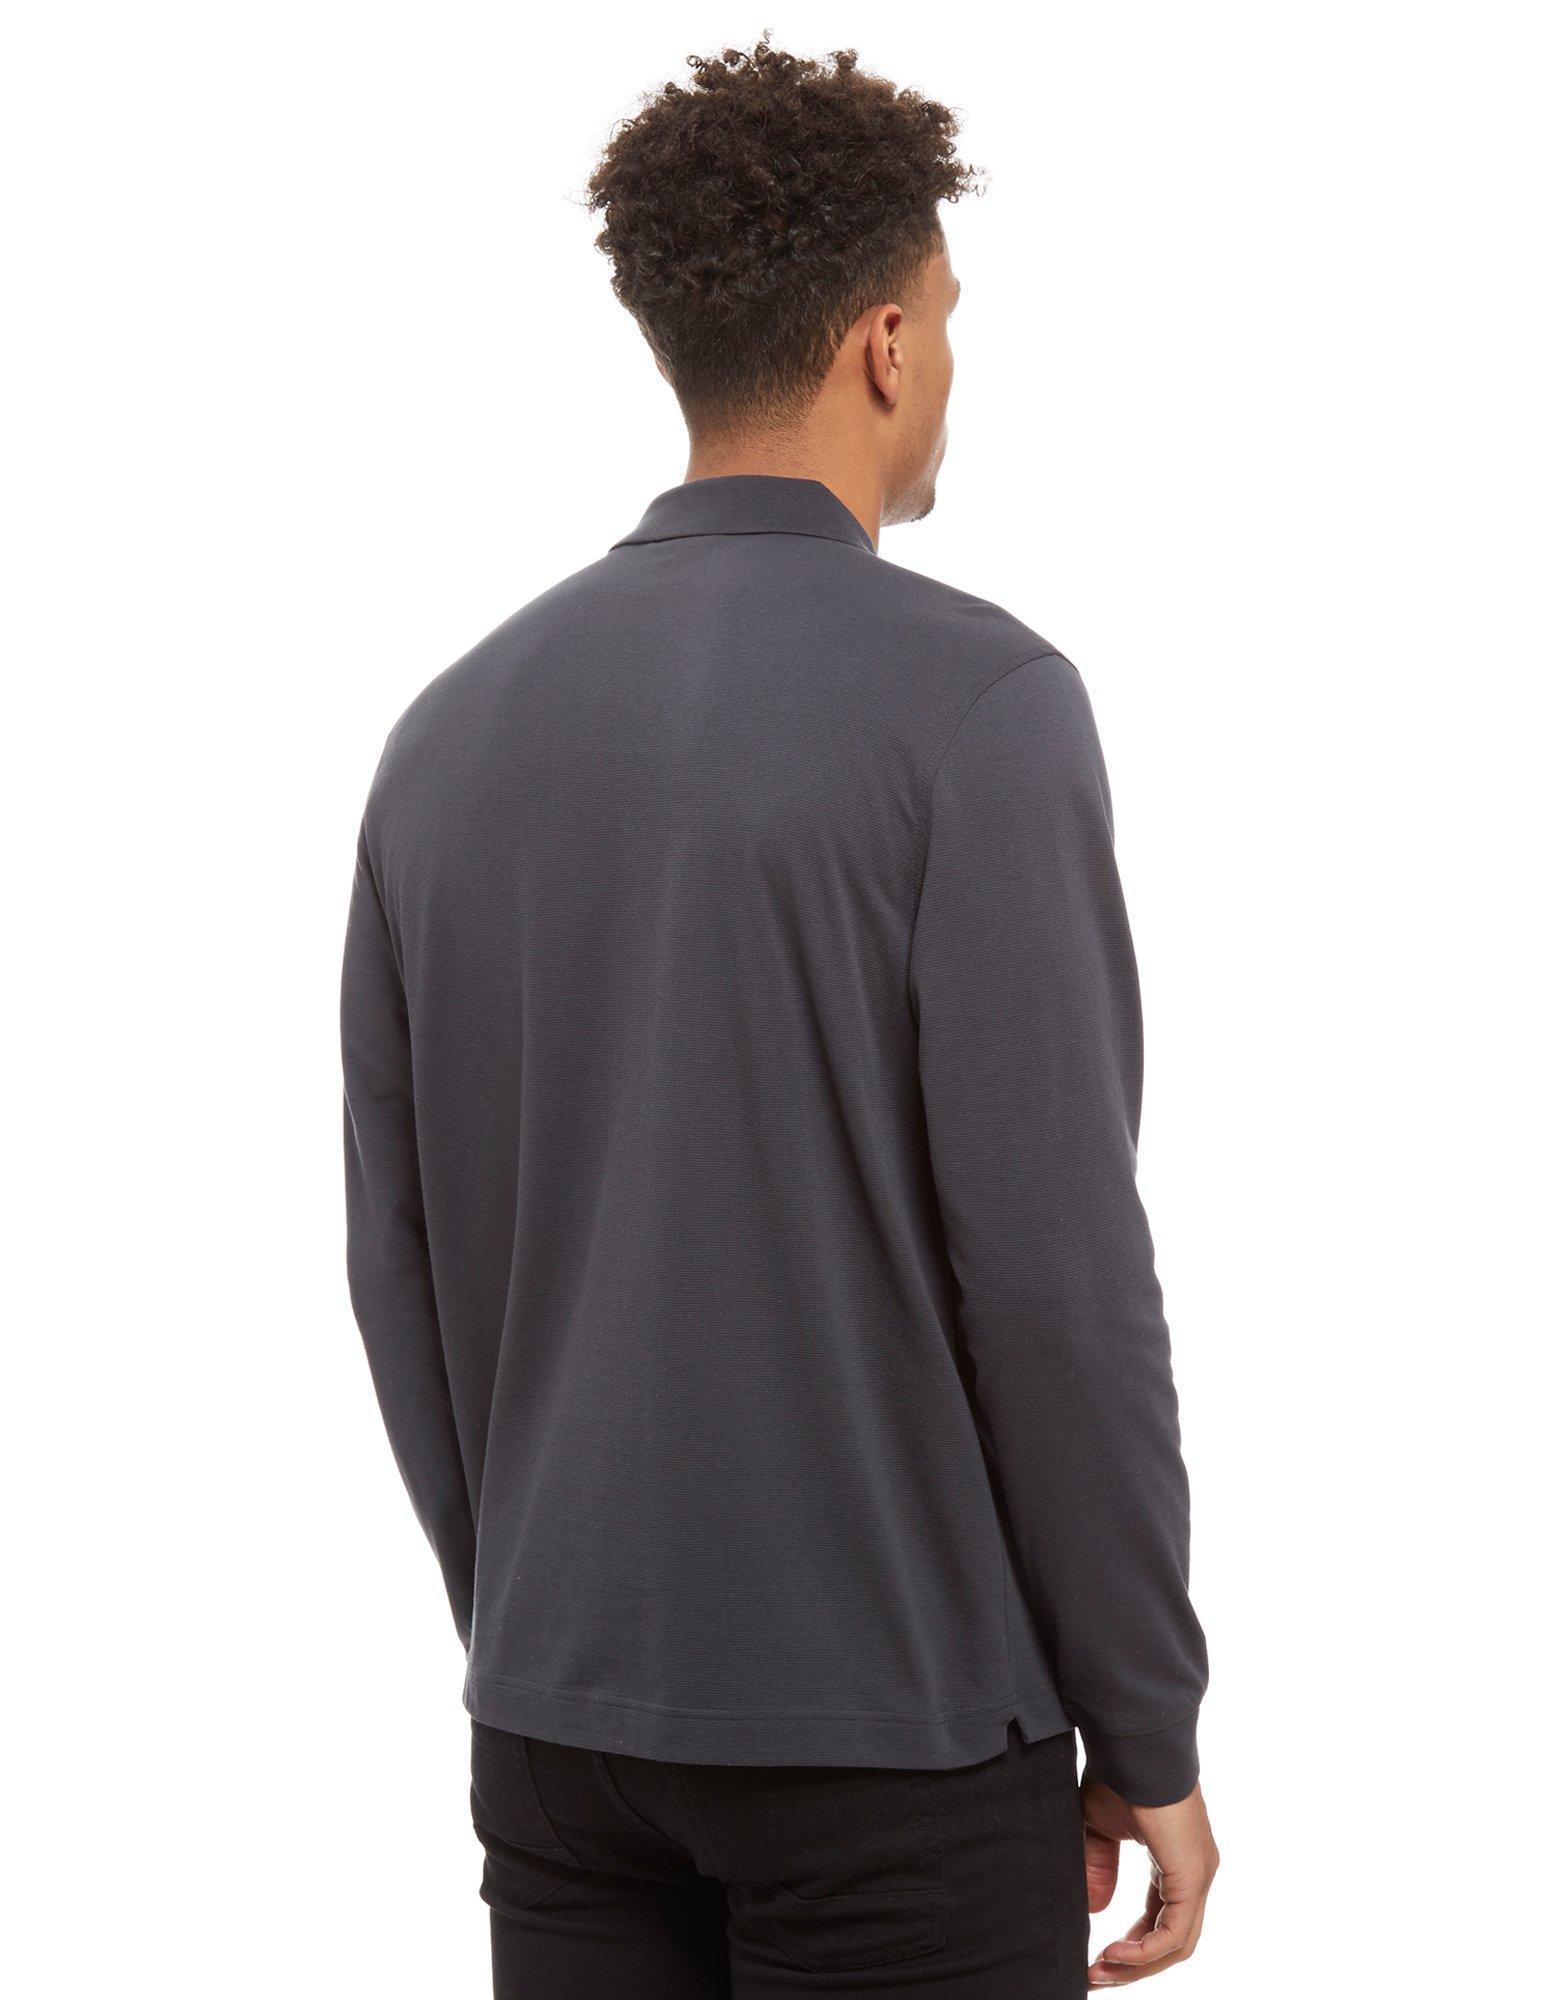 da595fc326c6 Lacoste Alligator Long Sleeve Polo Shirt in Gray for Men - Lyst